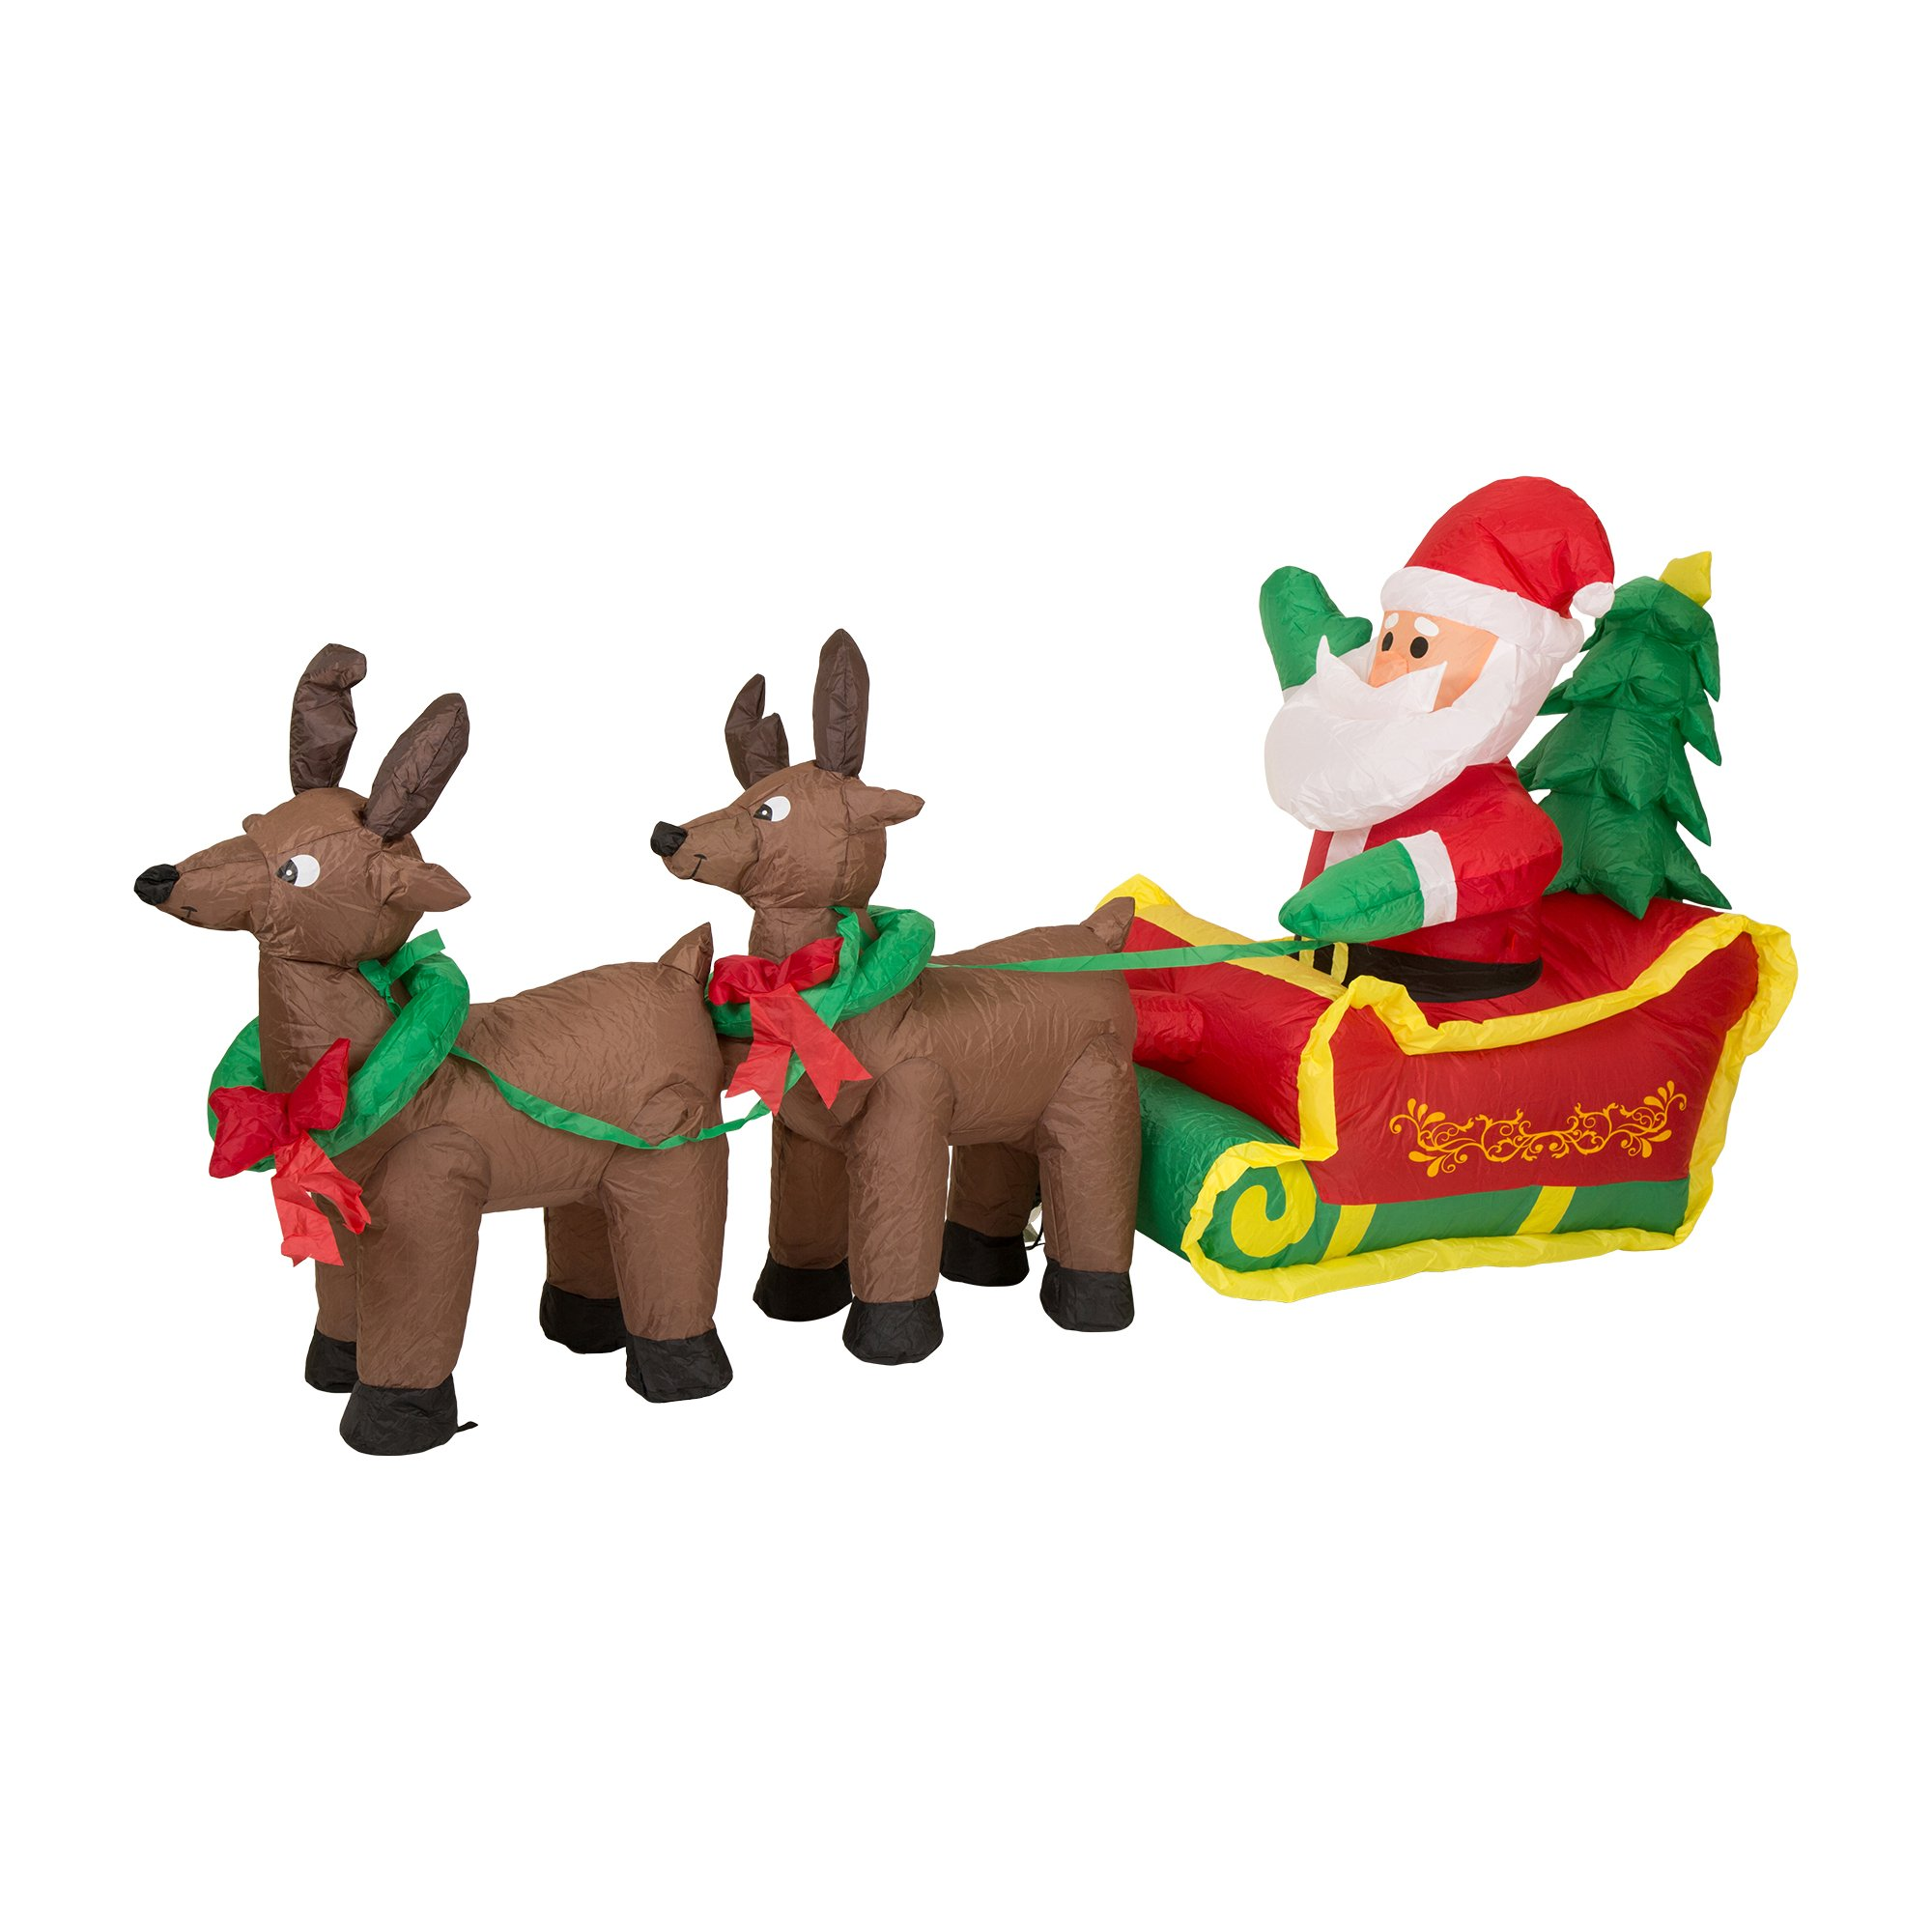 Glitzhome Christmas Outdoor Lighted Inflatable Decor (Santa Sleigh)